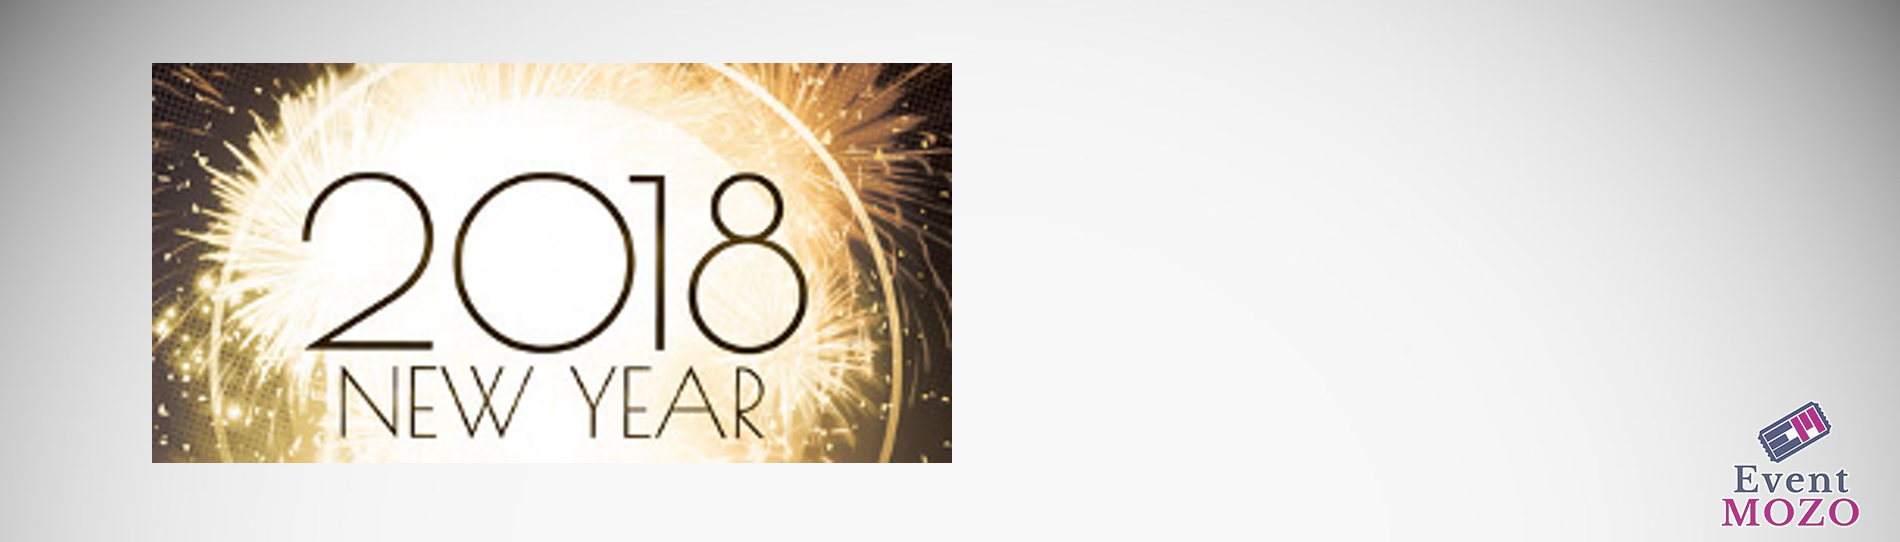 EventMozo New Years Eve Fireworks Gala Cruise